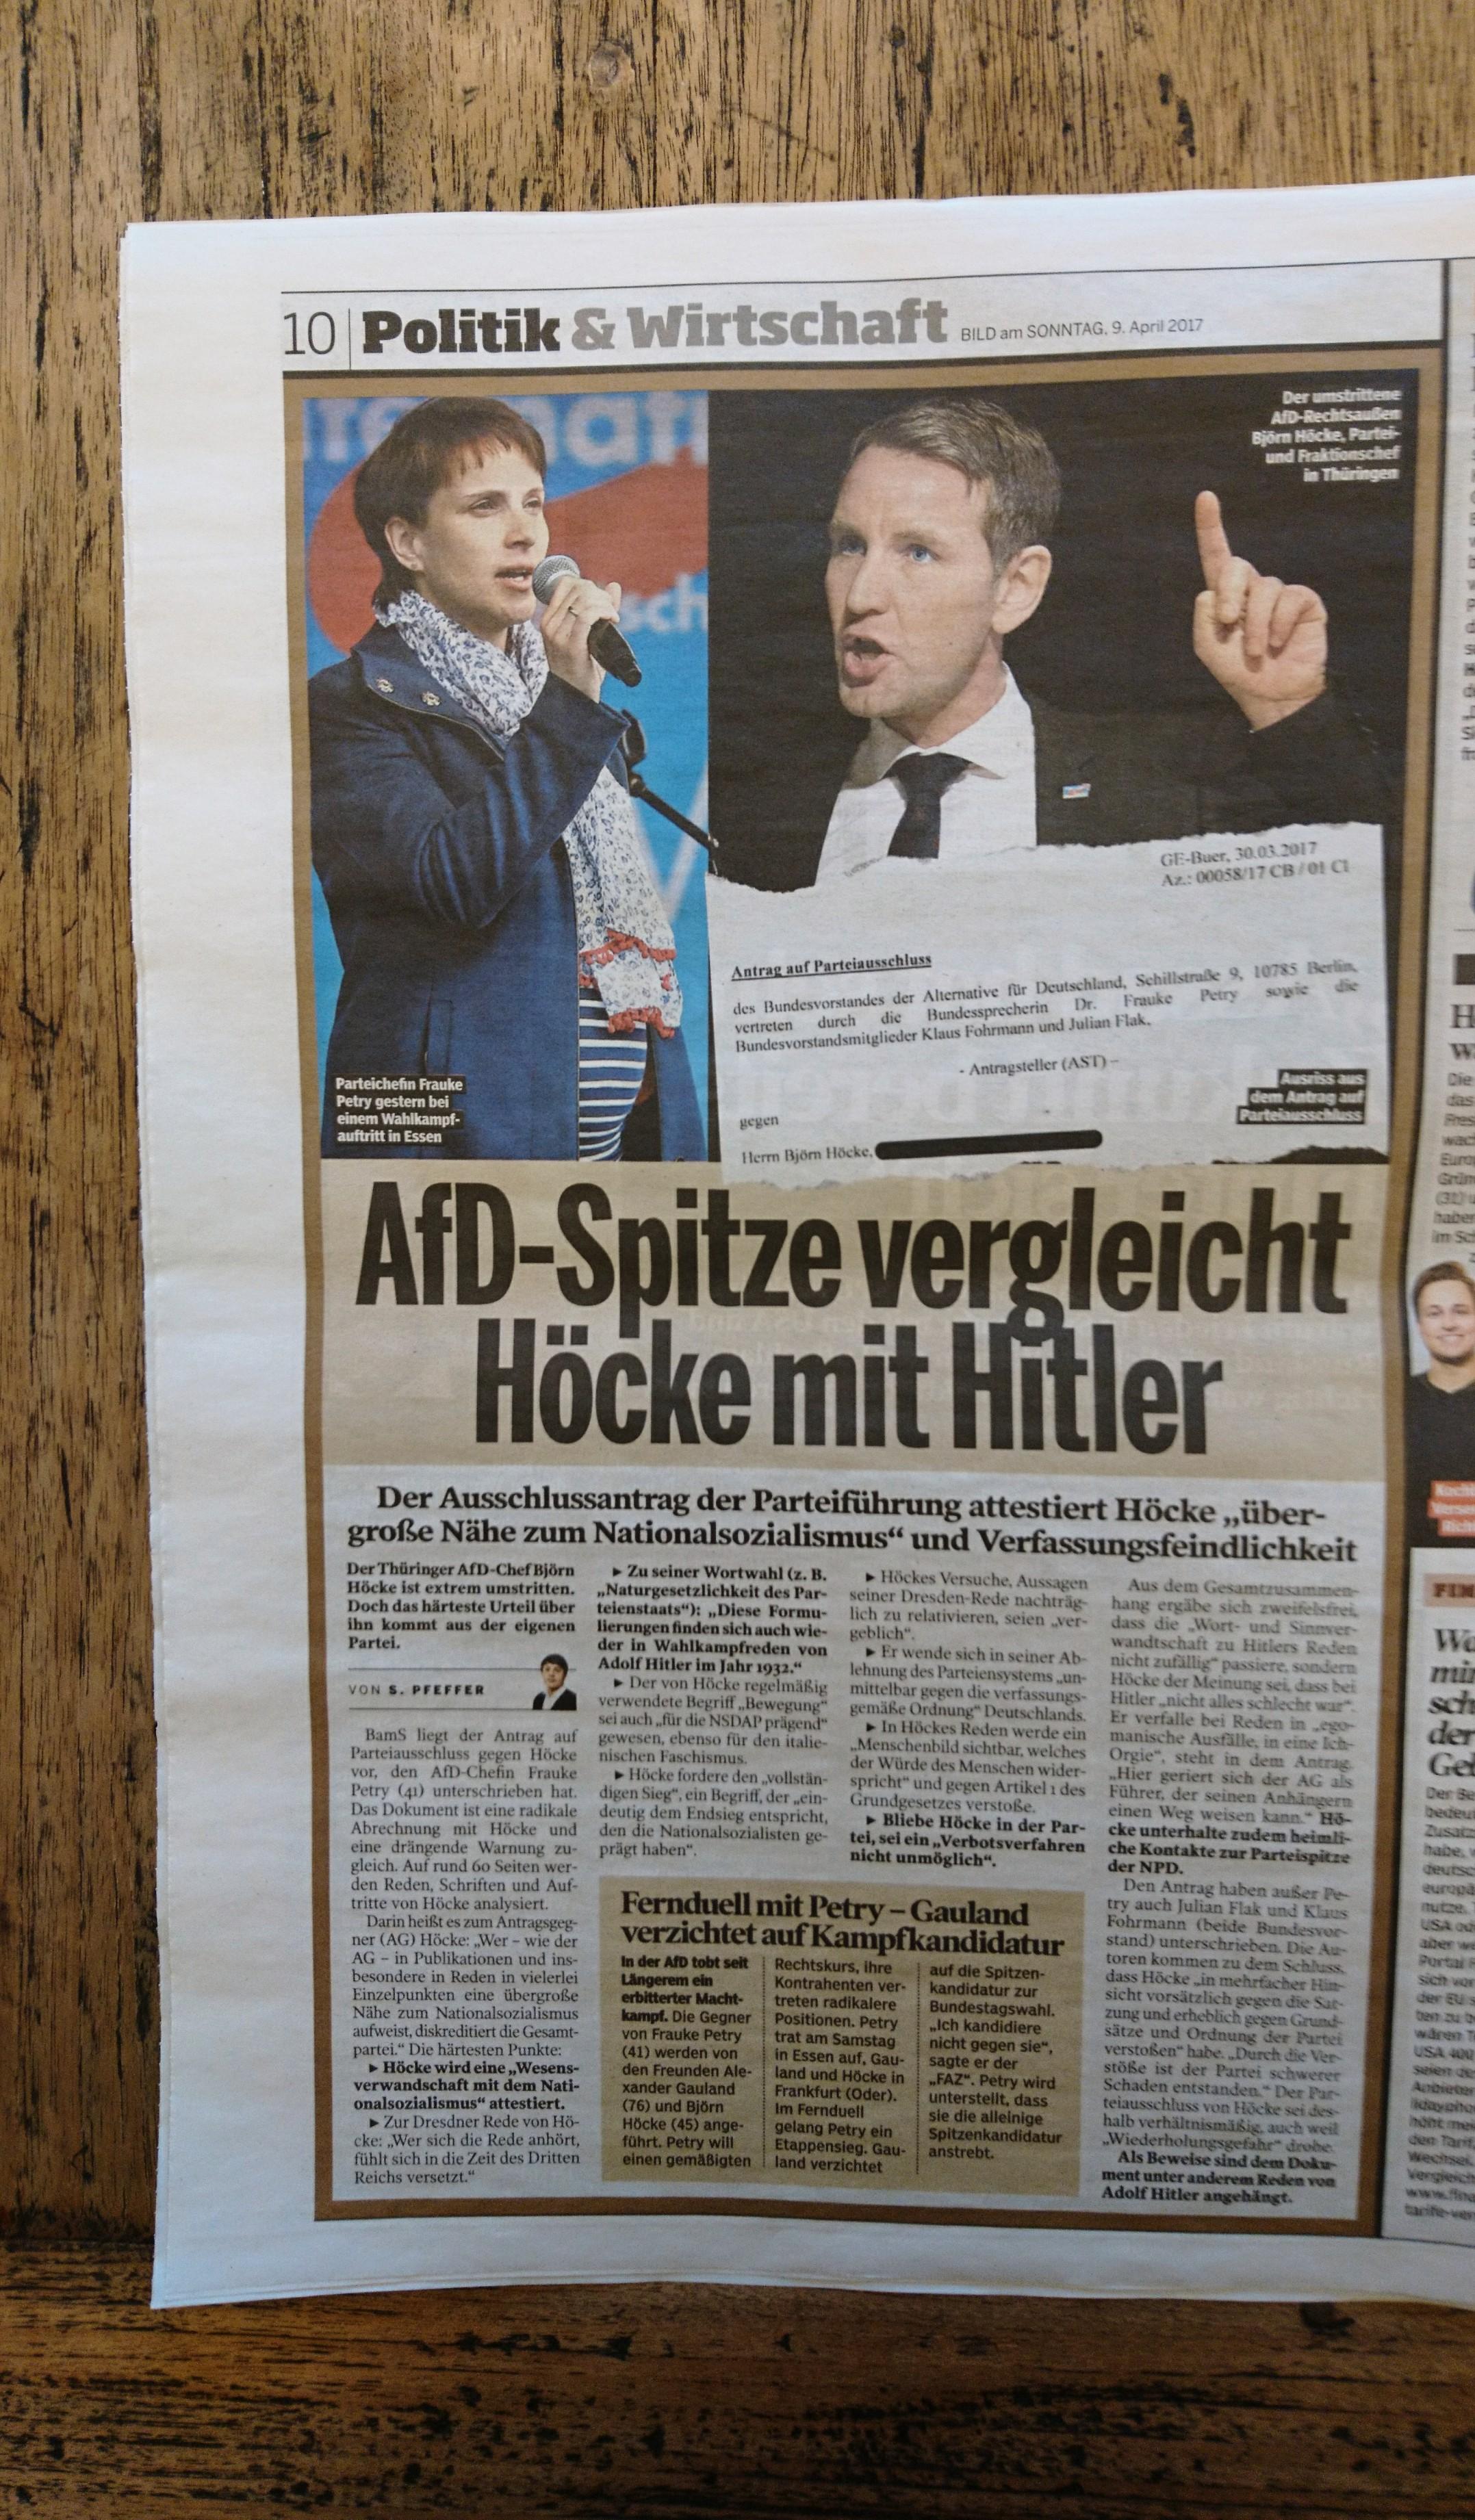 AfD Höcke Ausschlussantrag BamS 09. April 2017